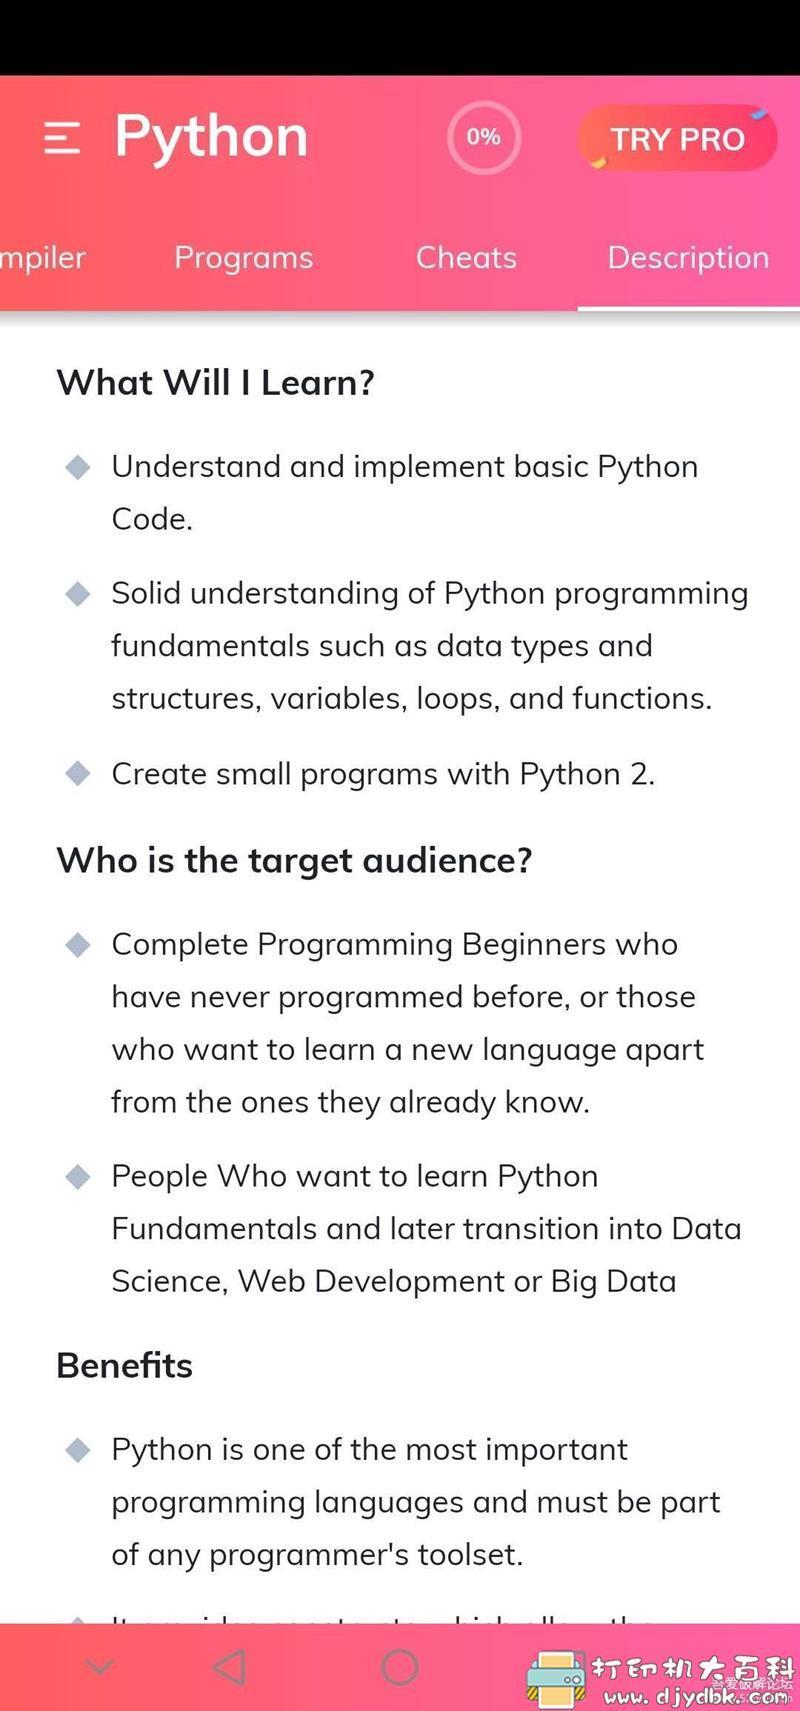 [Android]【Learn Python】学习Python的手机app图片 No.1